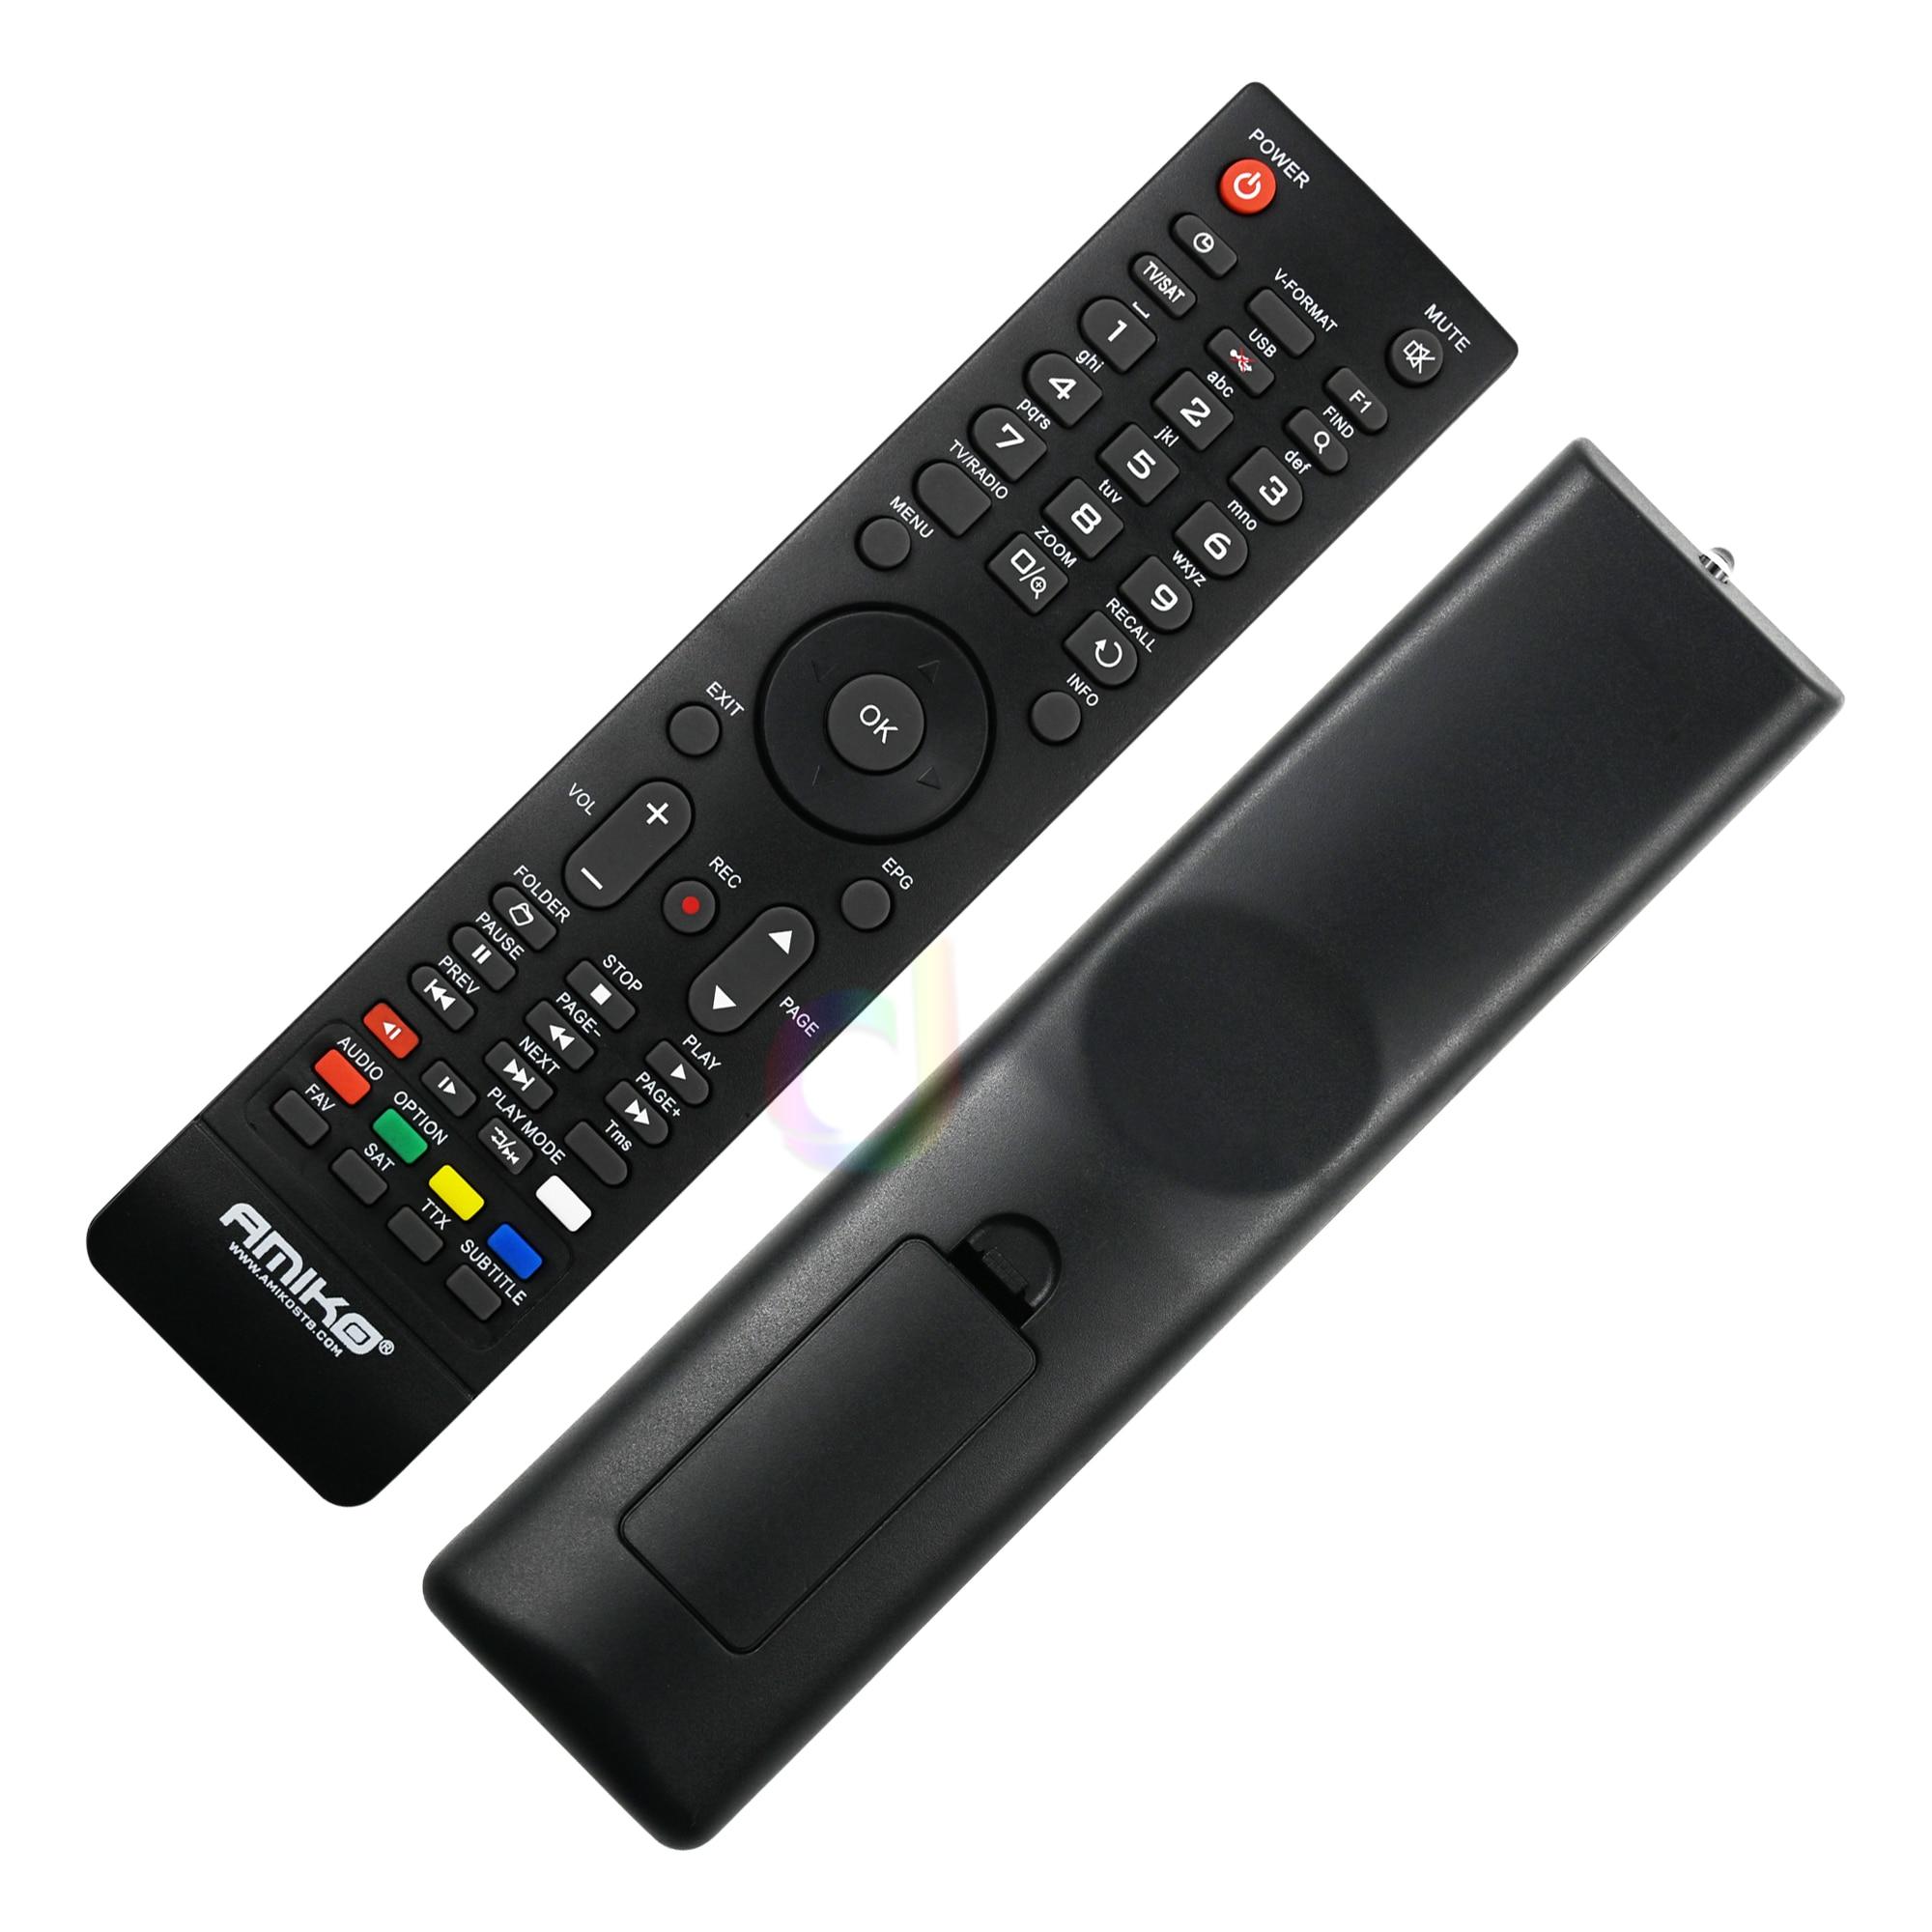 Télécommande pour AMIKO Mini HD 8150 8200 8300 8360 8840 SHD 7900 8000 8110 8140 STHD 8820,8800, Micro Combo